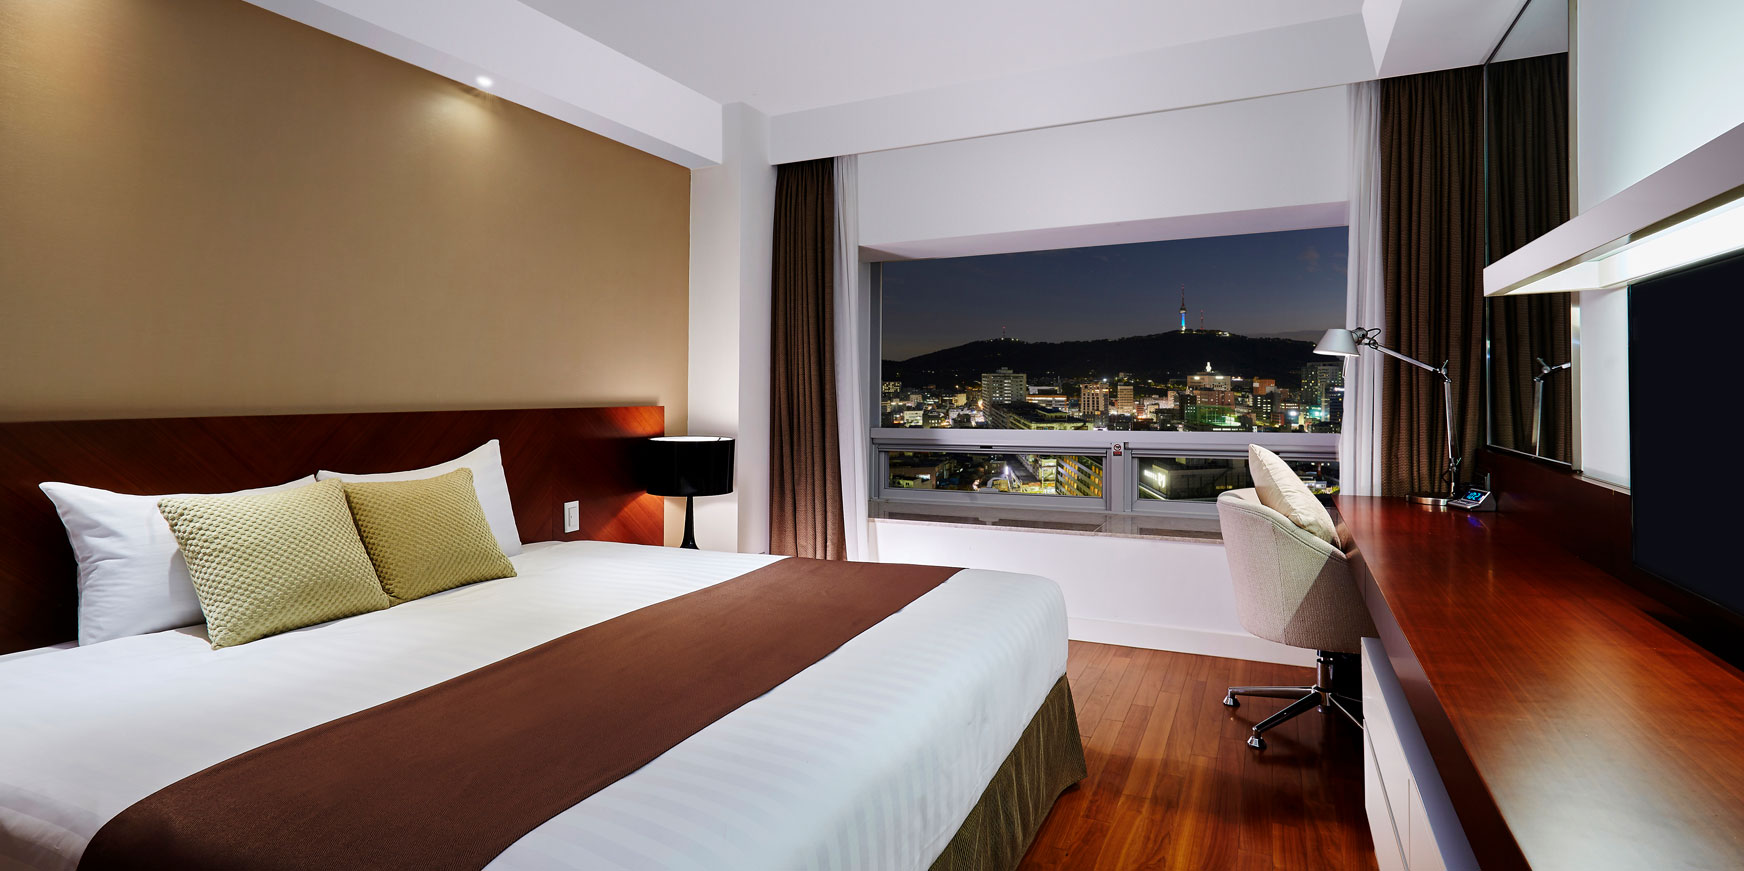 Book best western premier hotel kukdo seoul south korea hotels com - The